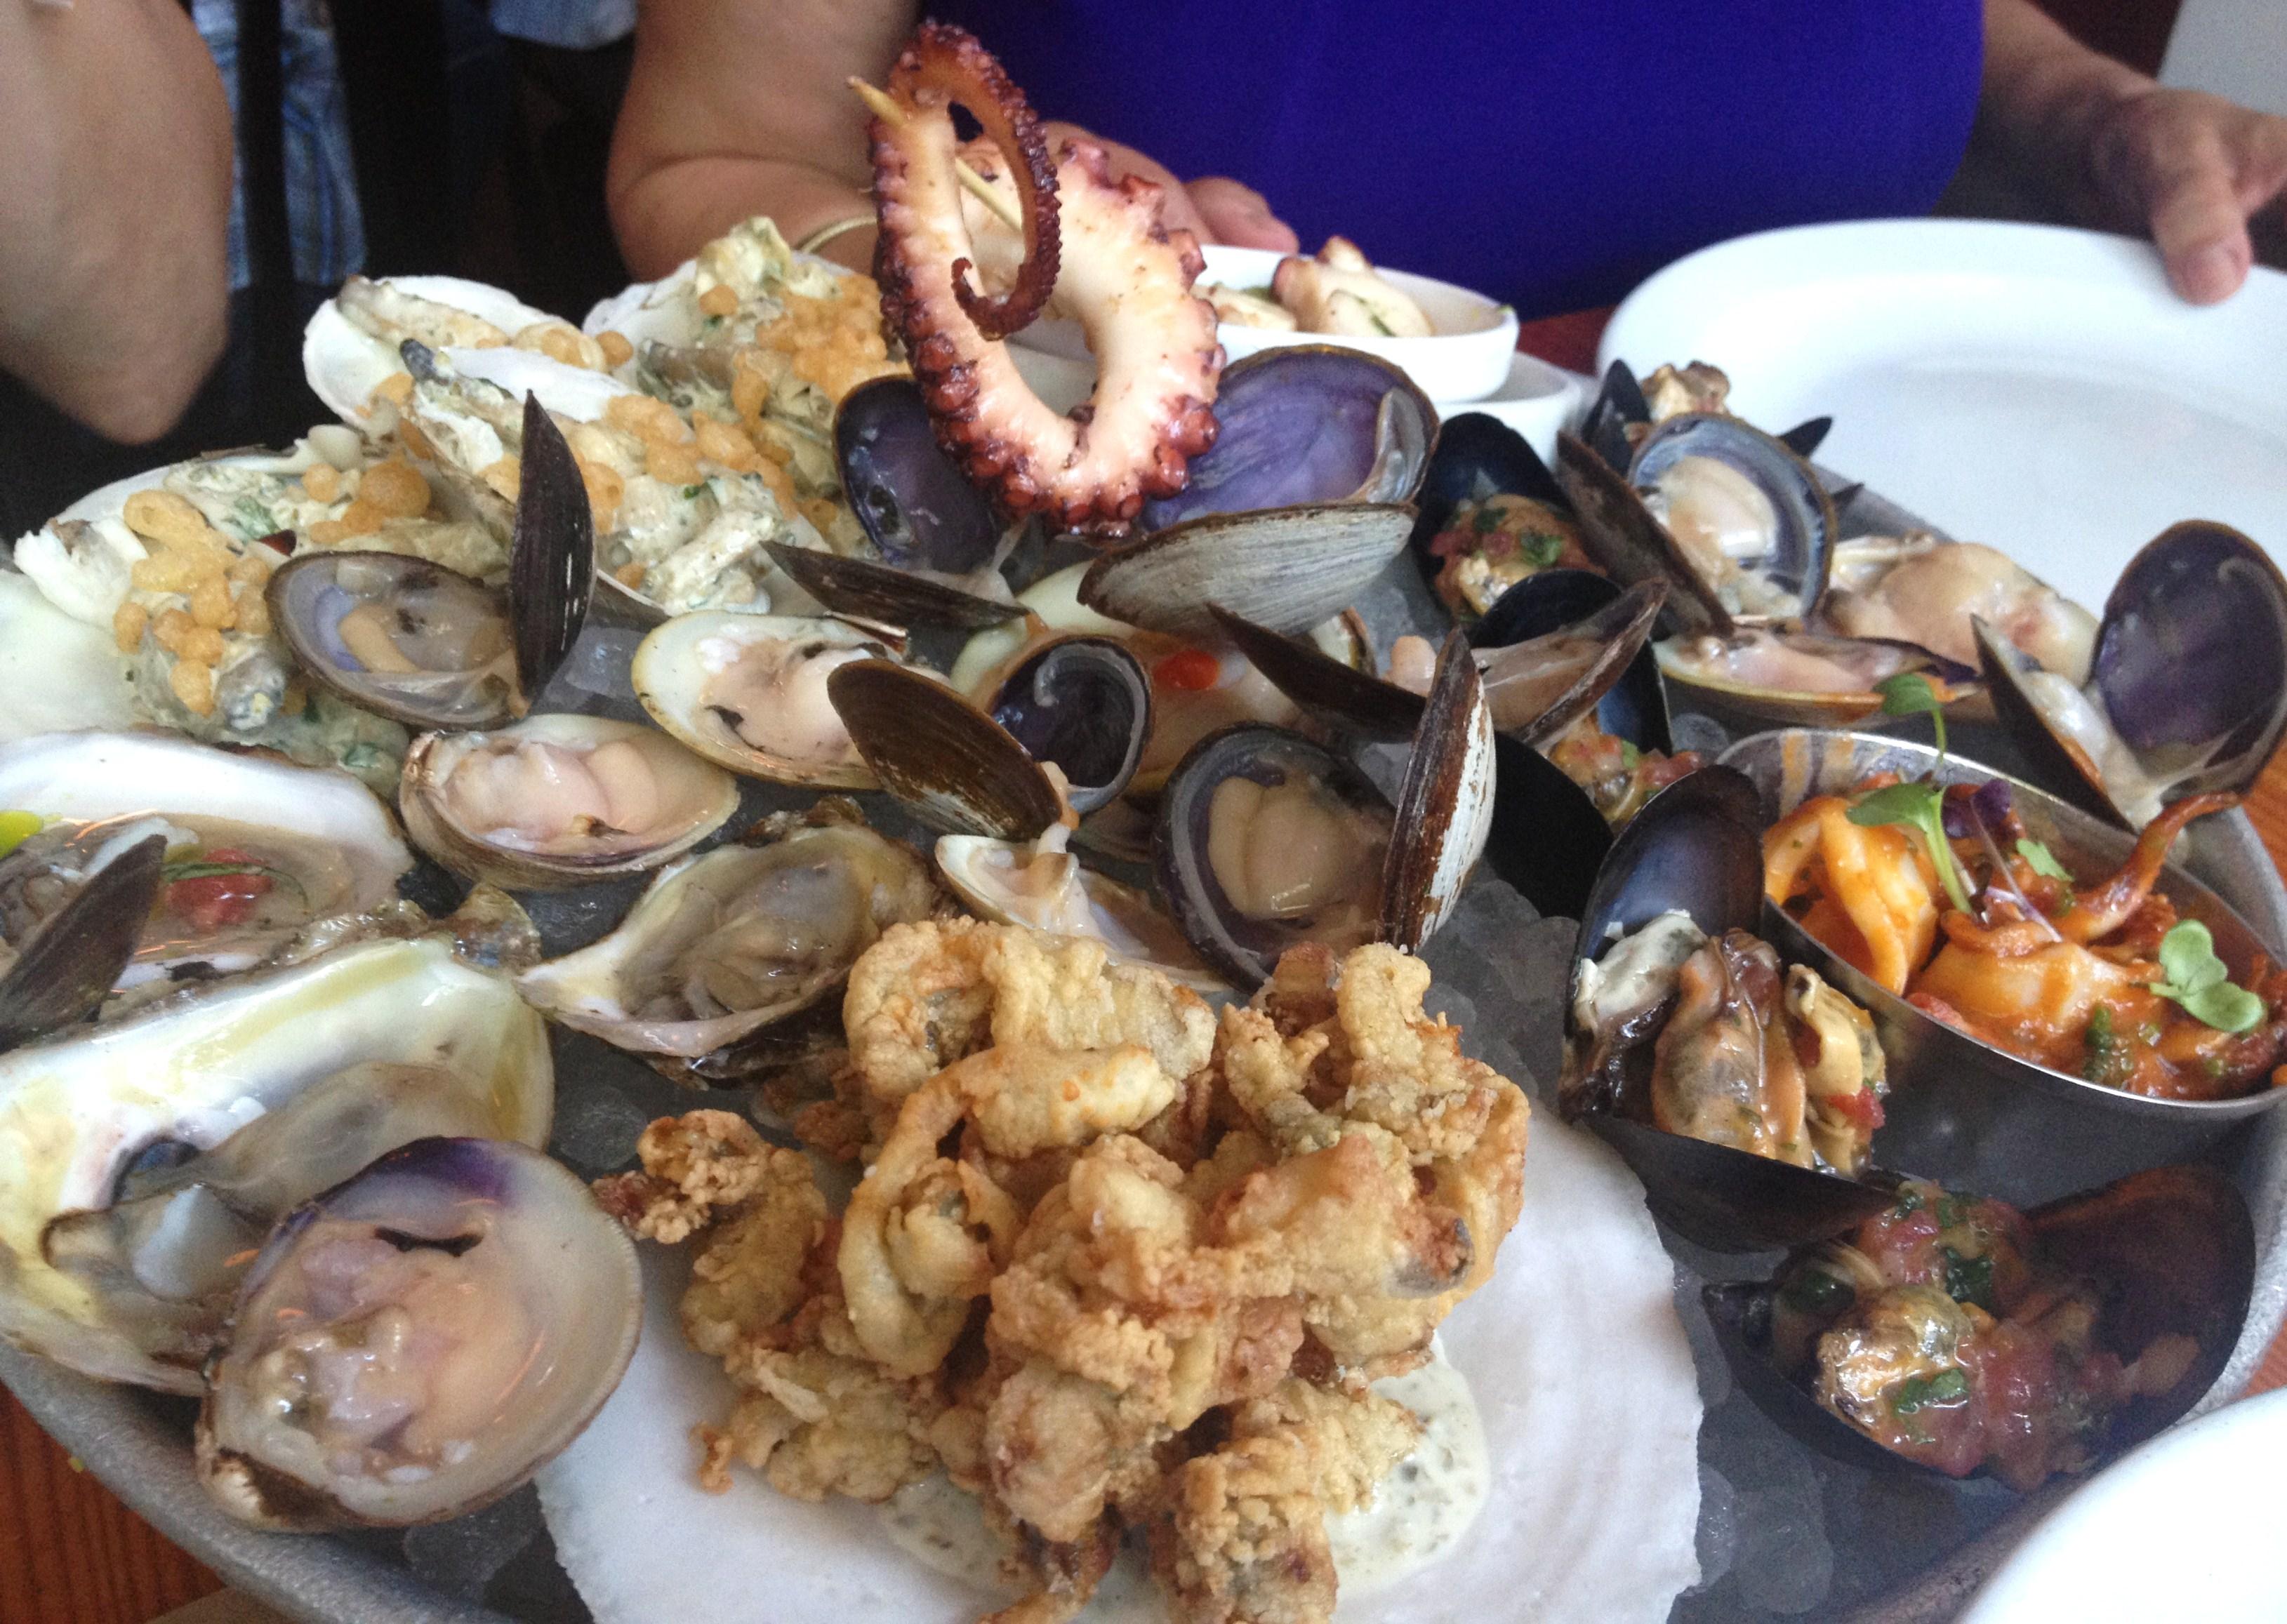 Restaurant roundup where to splurge on a fabulous dinner - Cuisiner pied de cochon ...